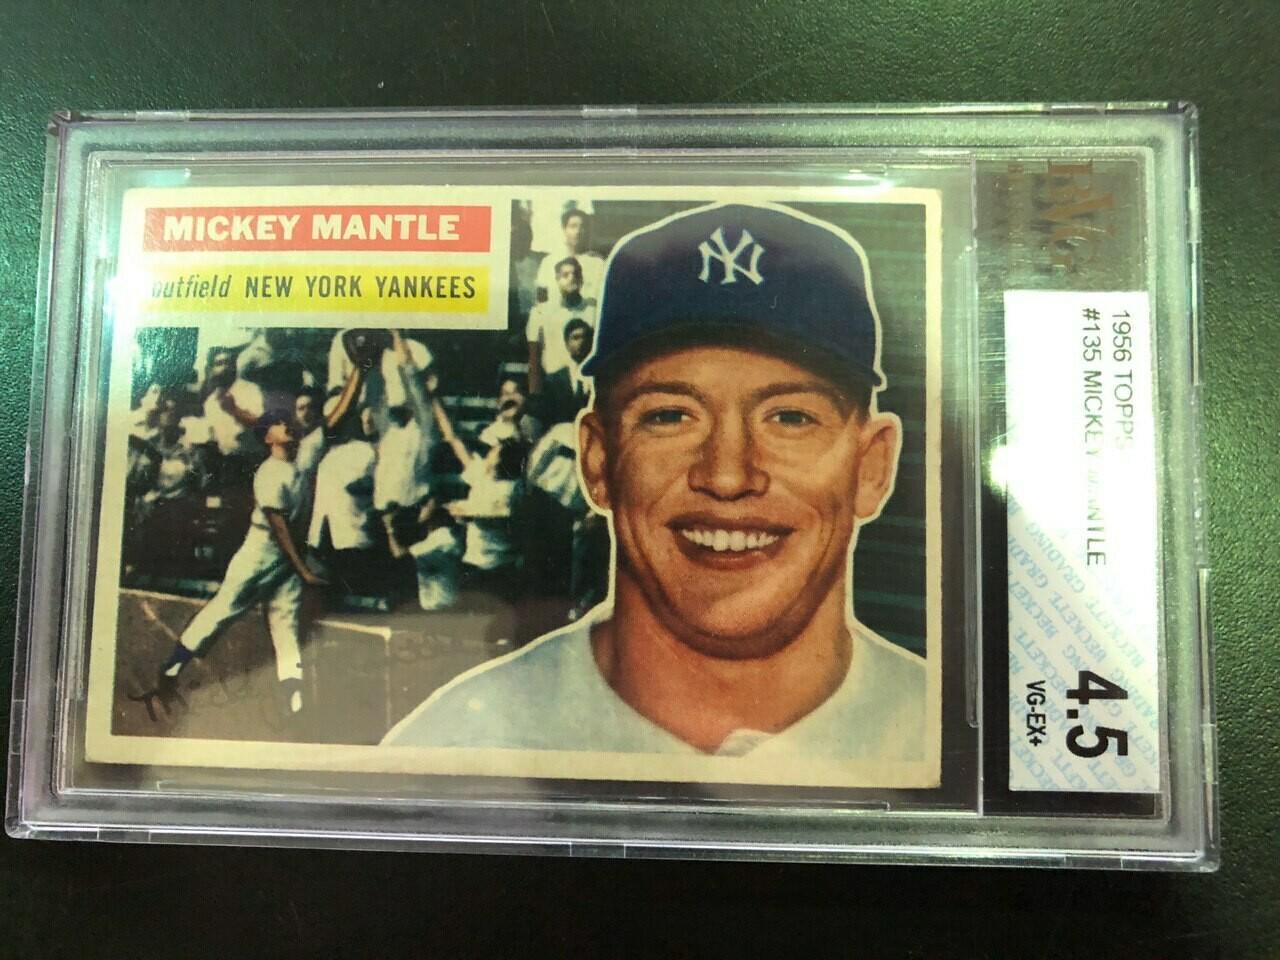 1956 Topps #135 Mickey Mantle, Beckett graded 4.5, $1200